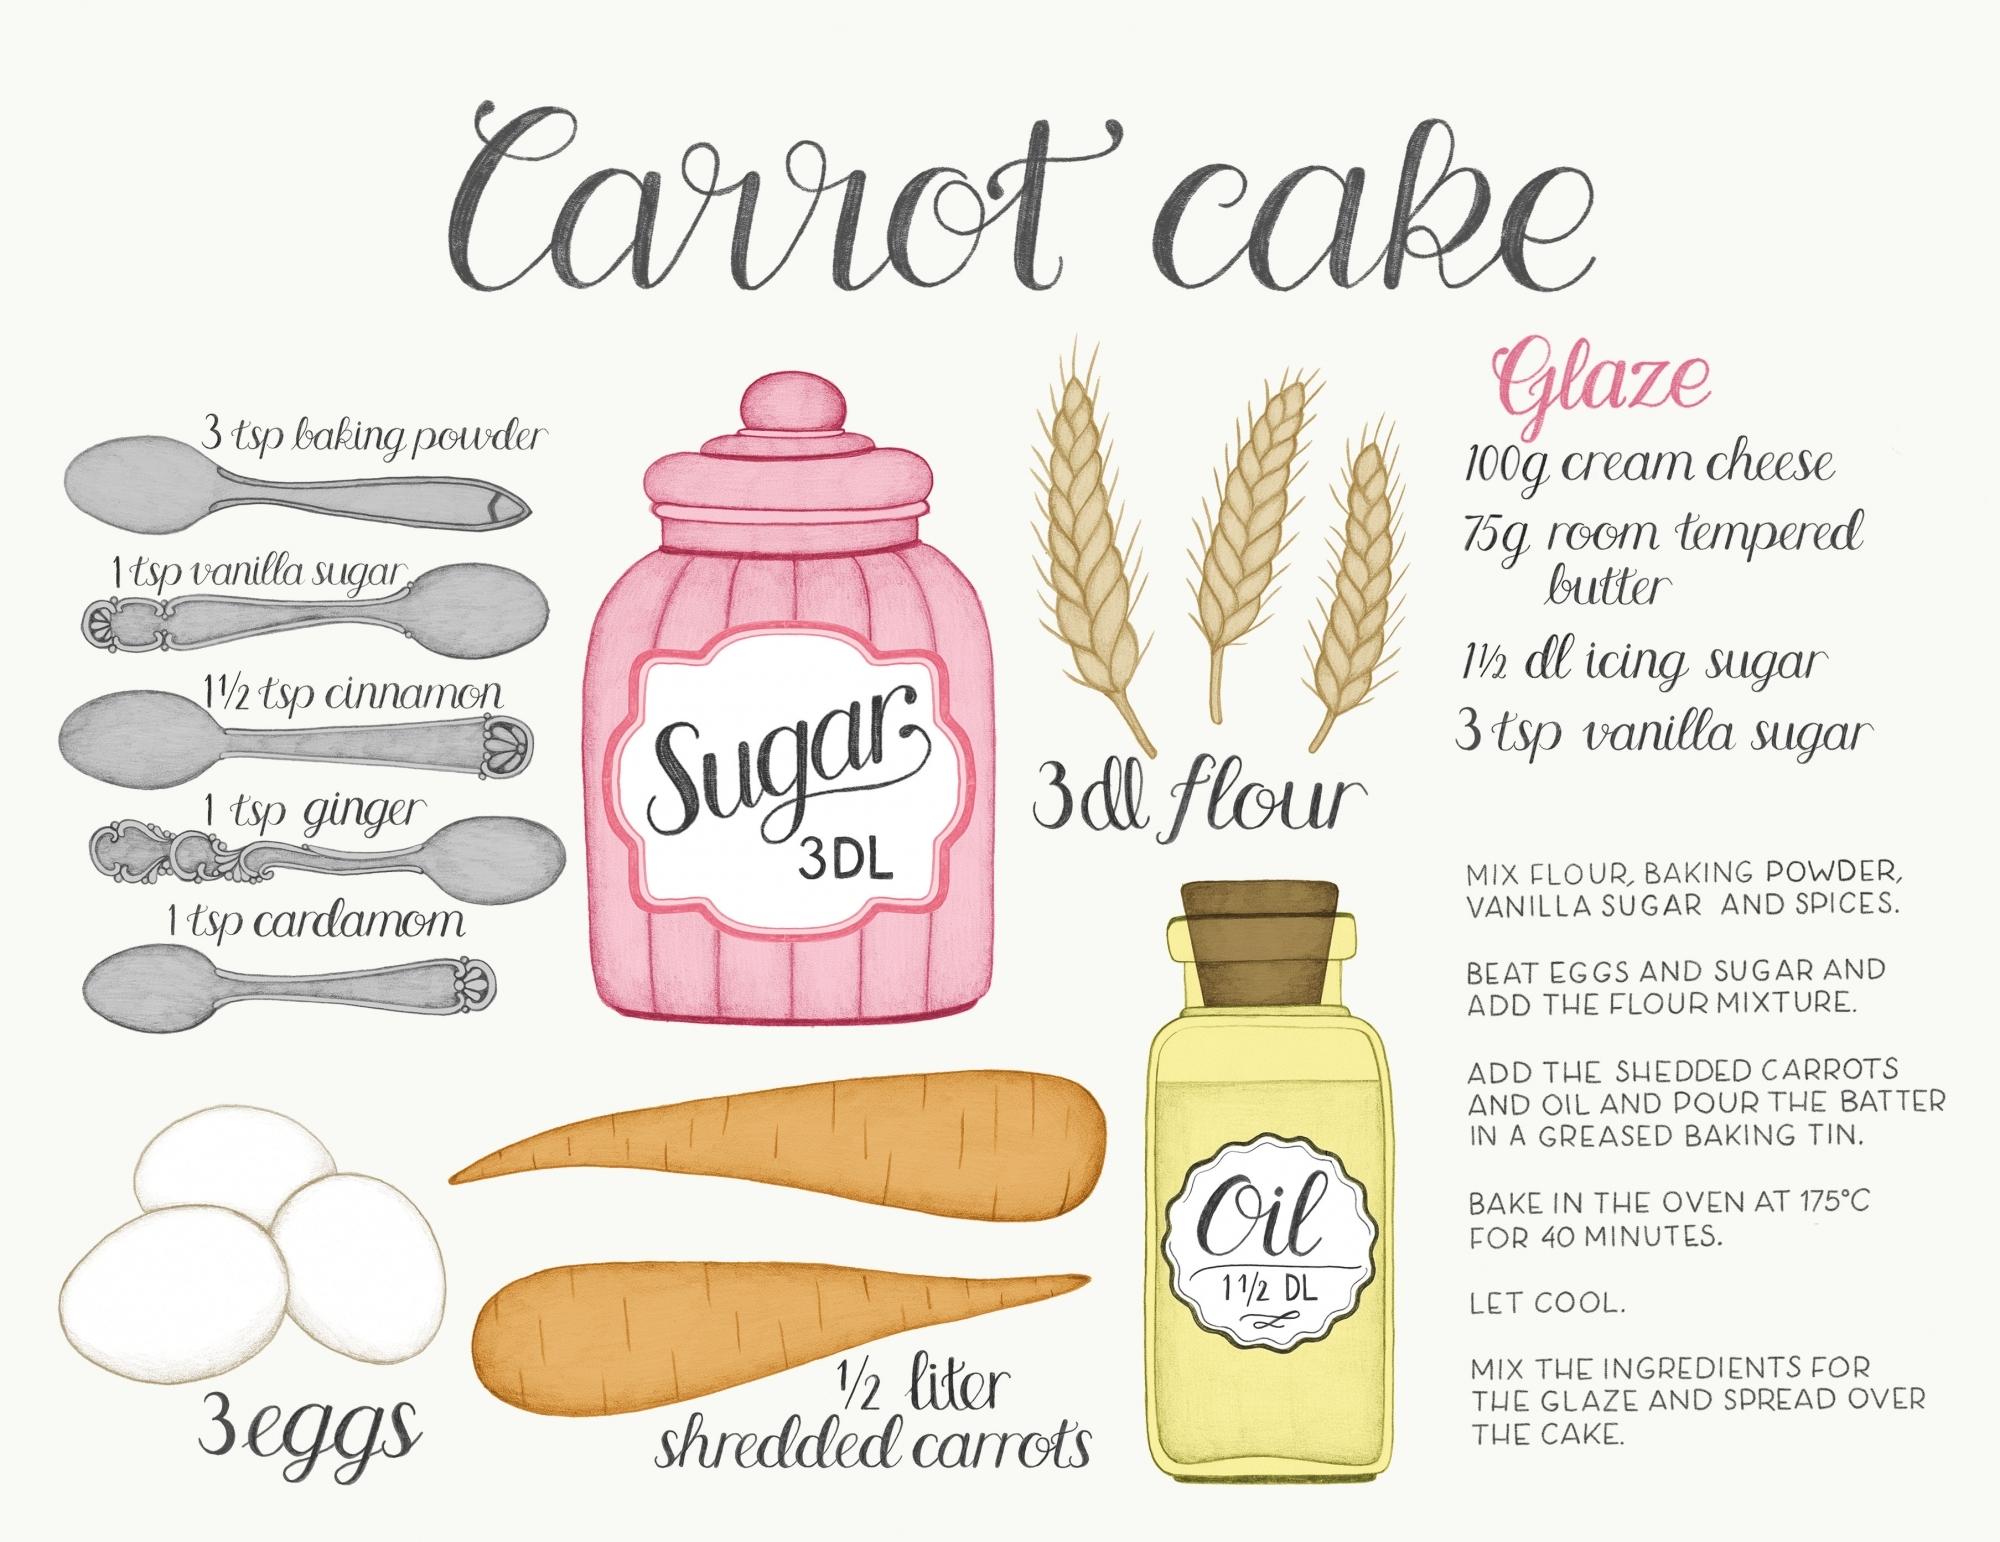 Carrot cake recipe illustration by  Tove Larris .